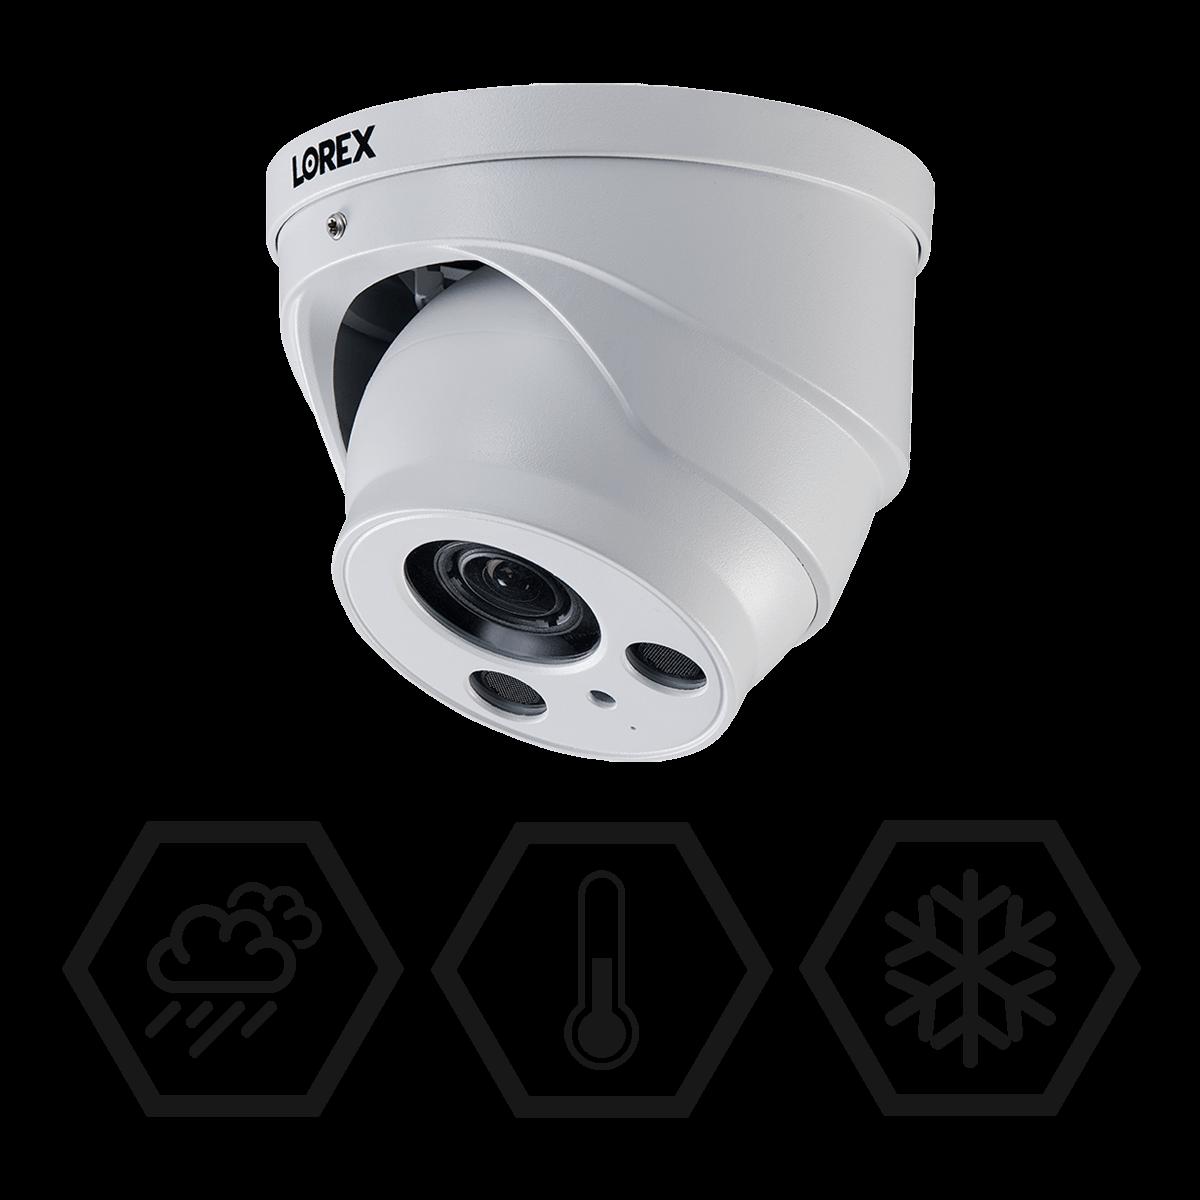 IP67 weatherproof security camera